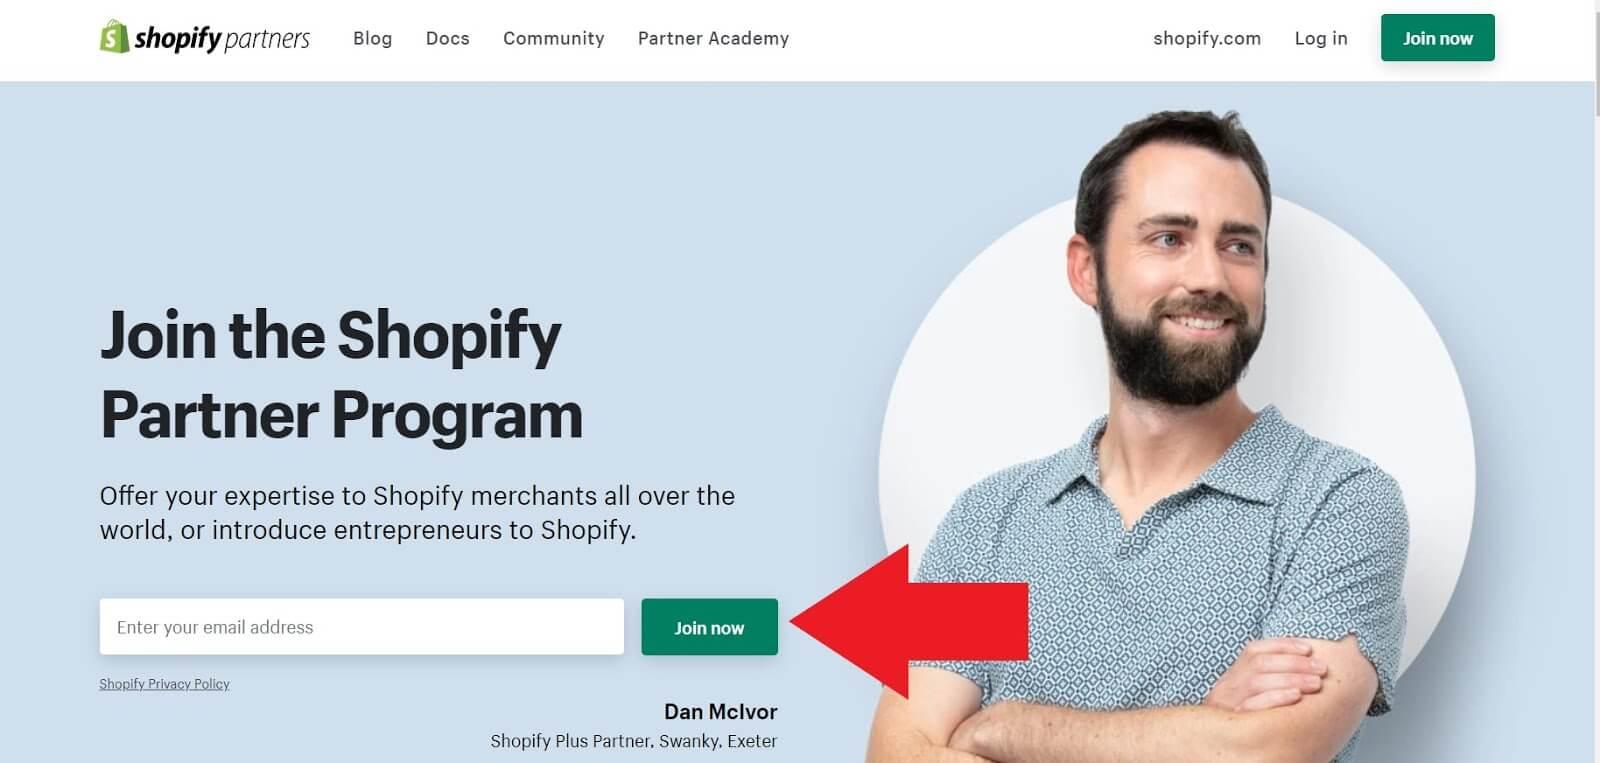 Shopify's Partner Program join up page